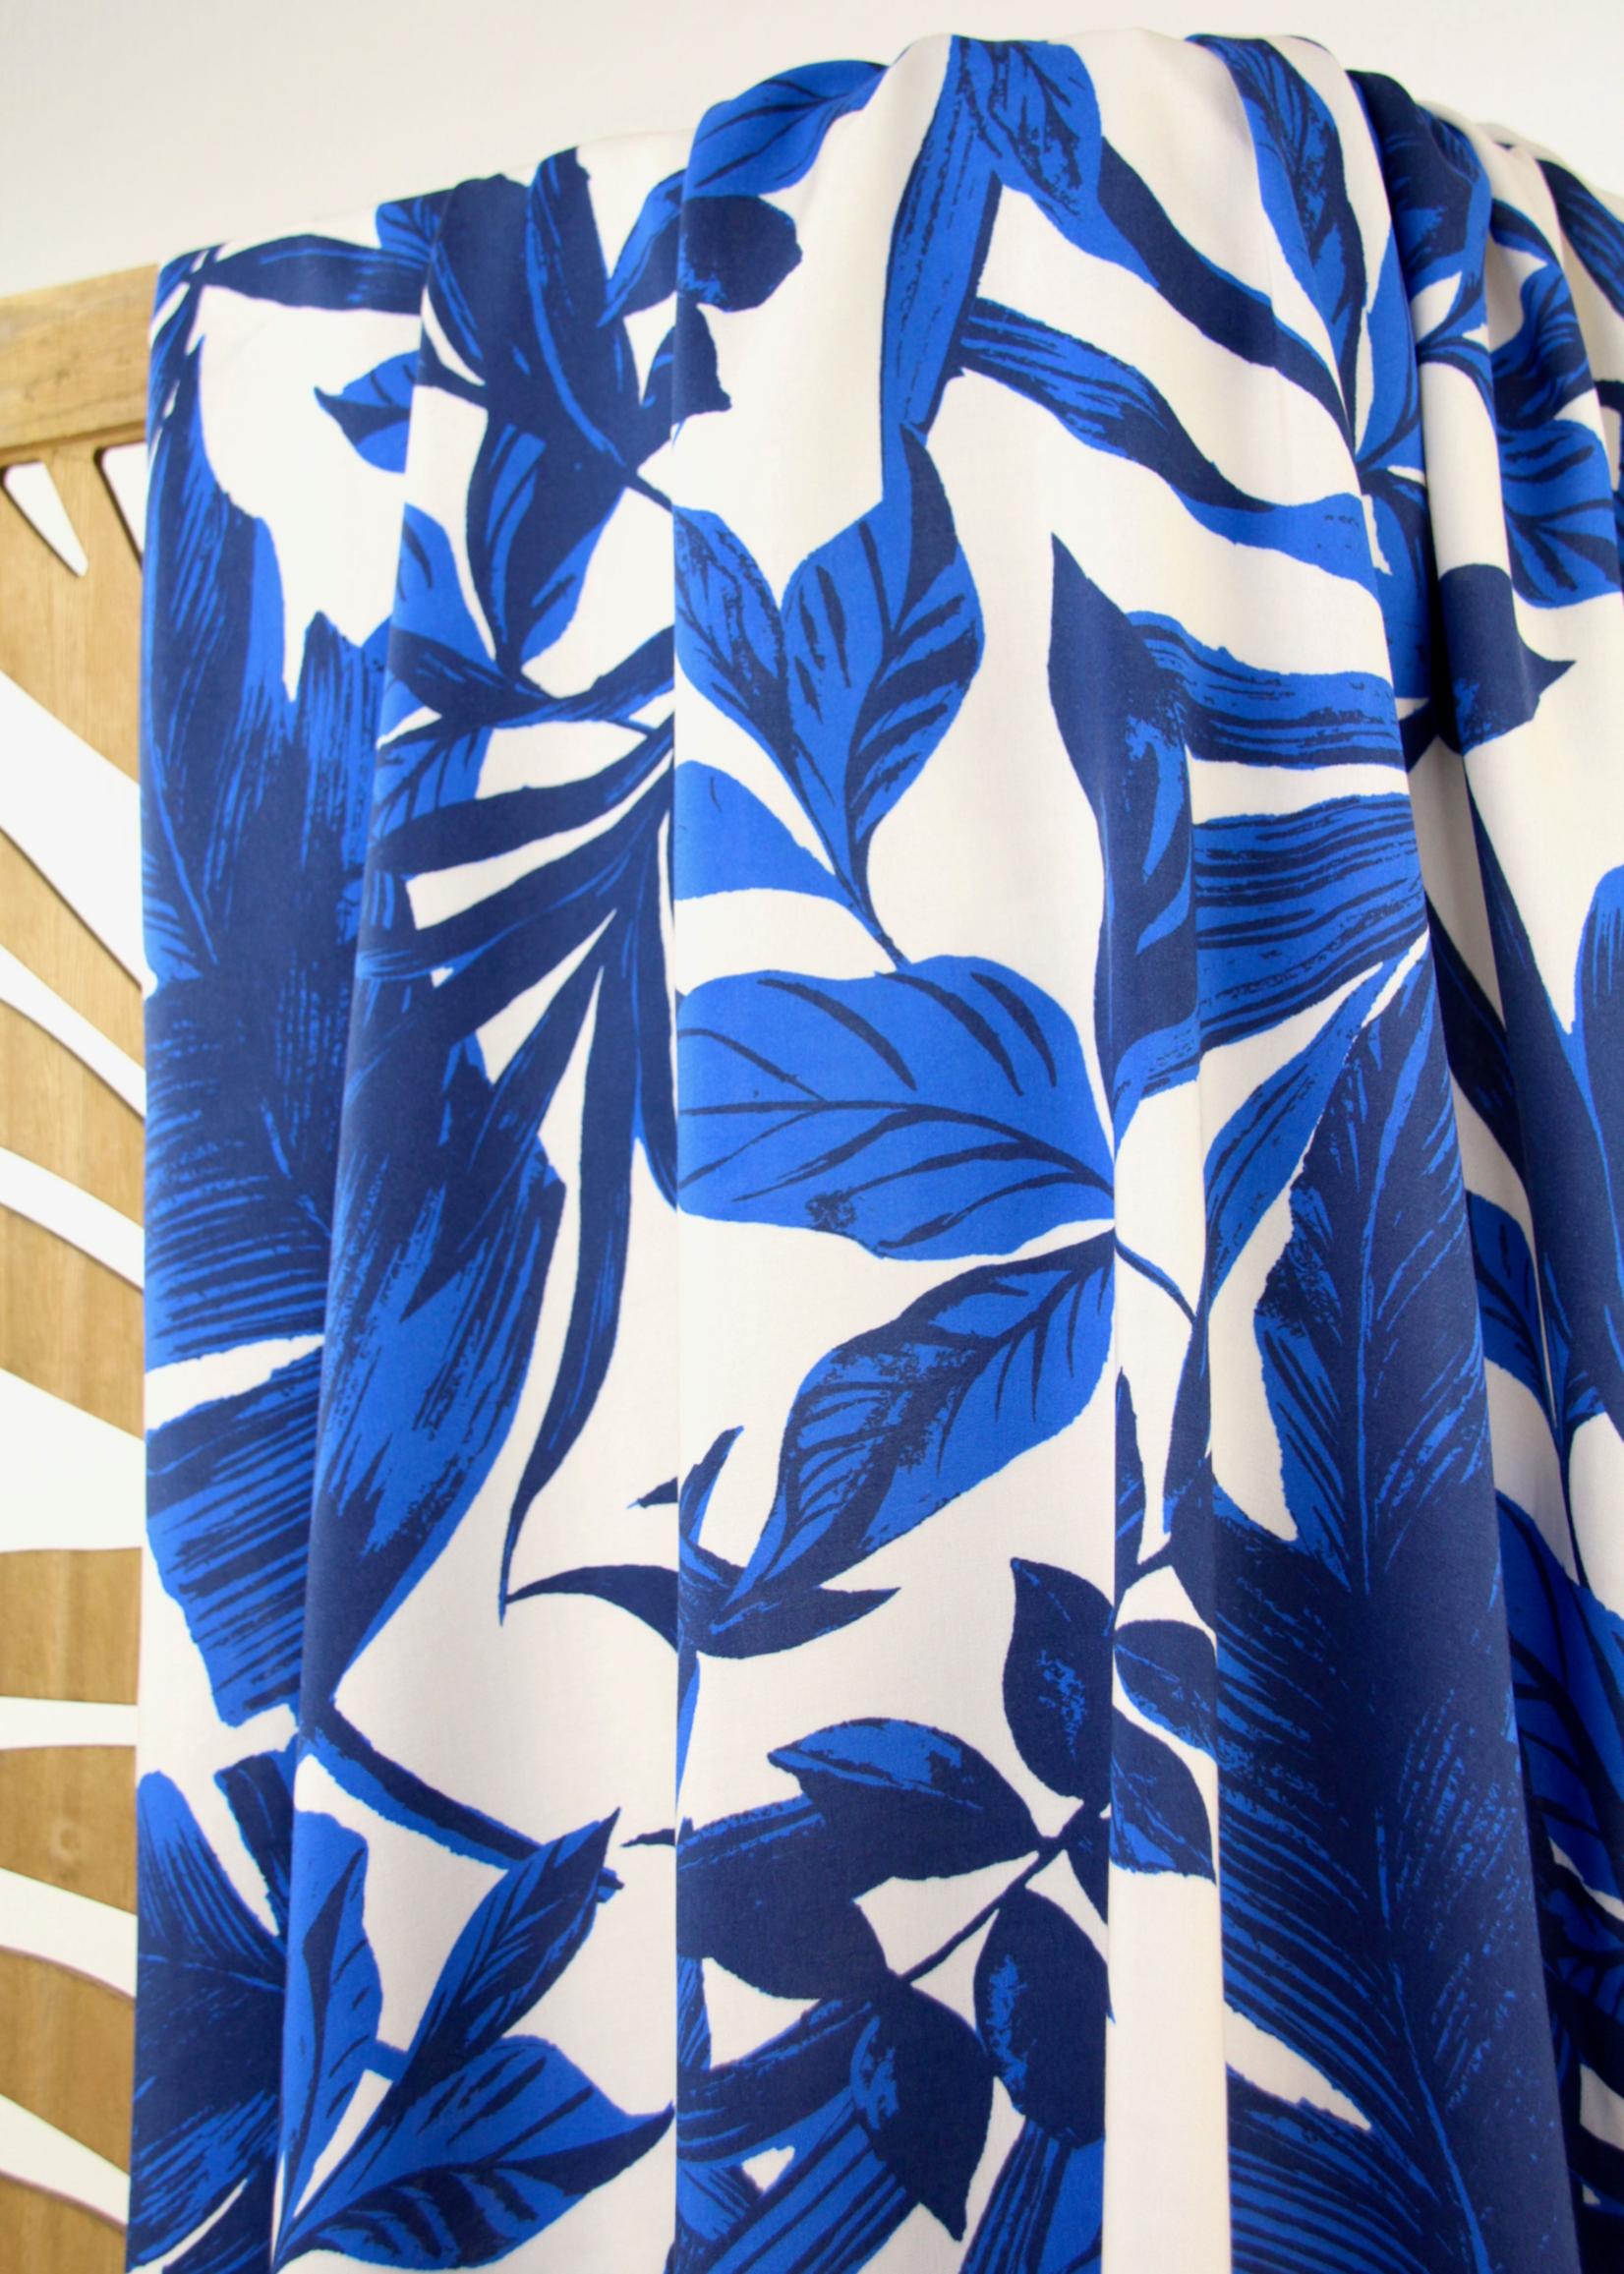 Atelier Jupe LARGE BLUE LEAVES